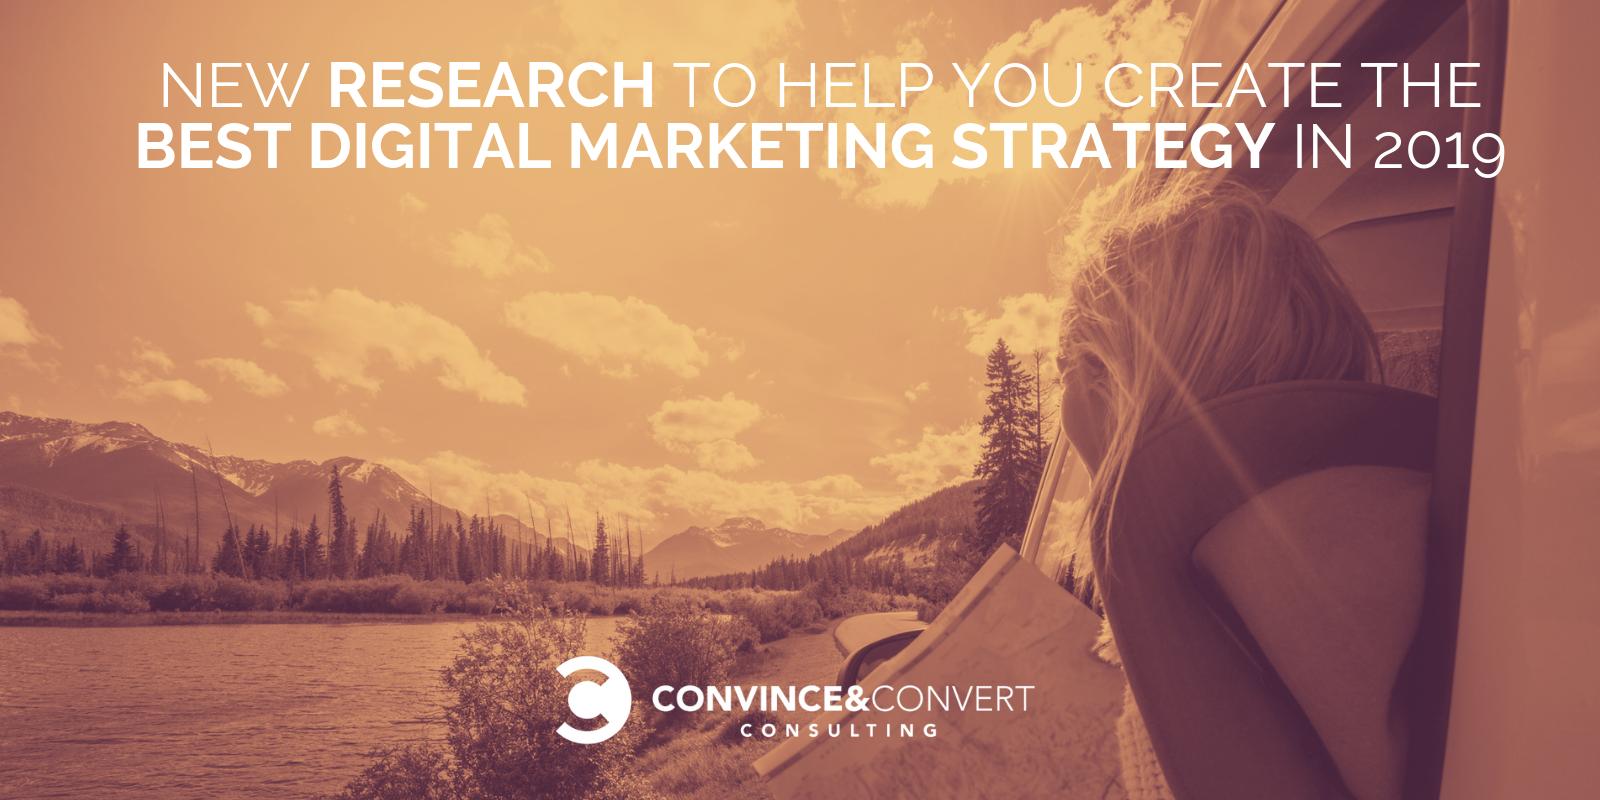 ricerca di marketing digitale 2019